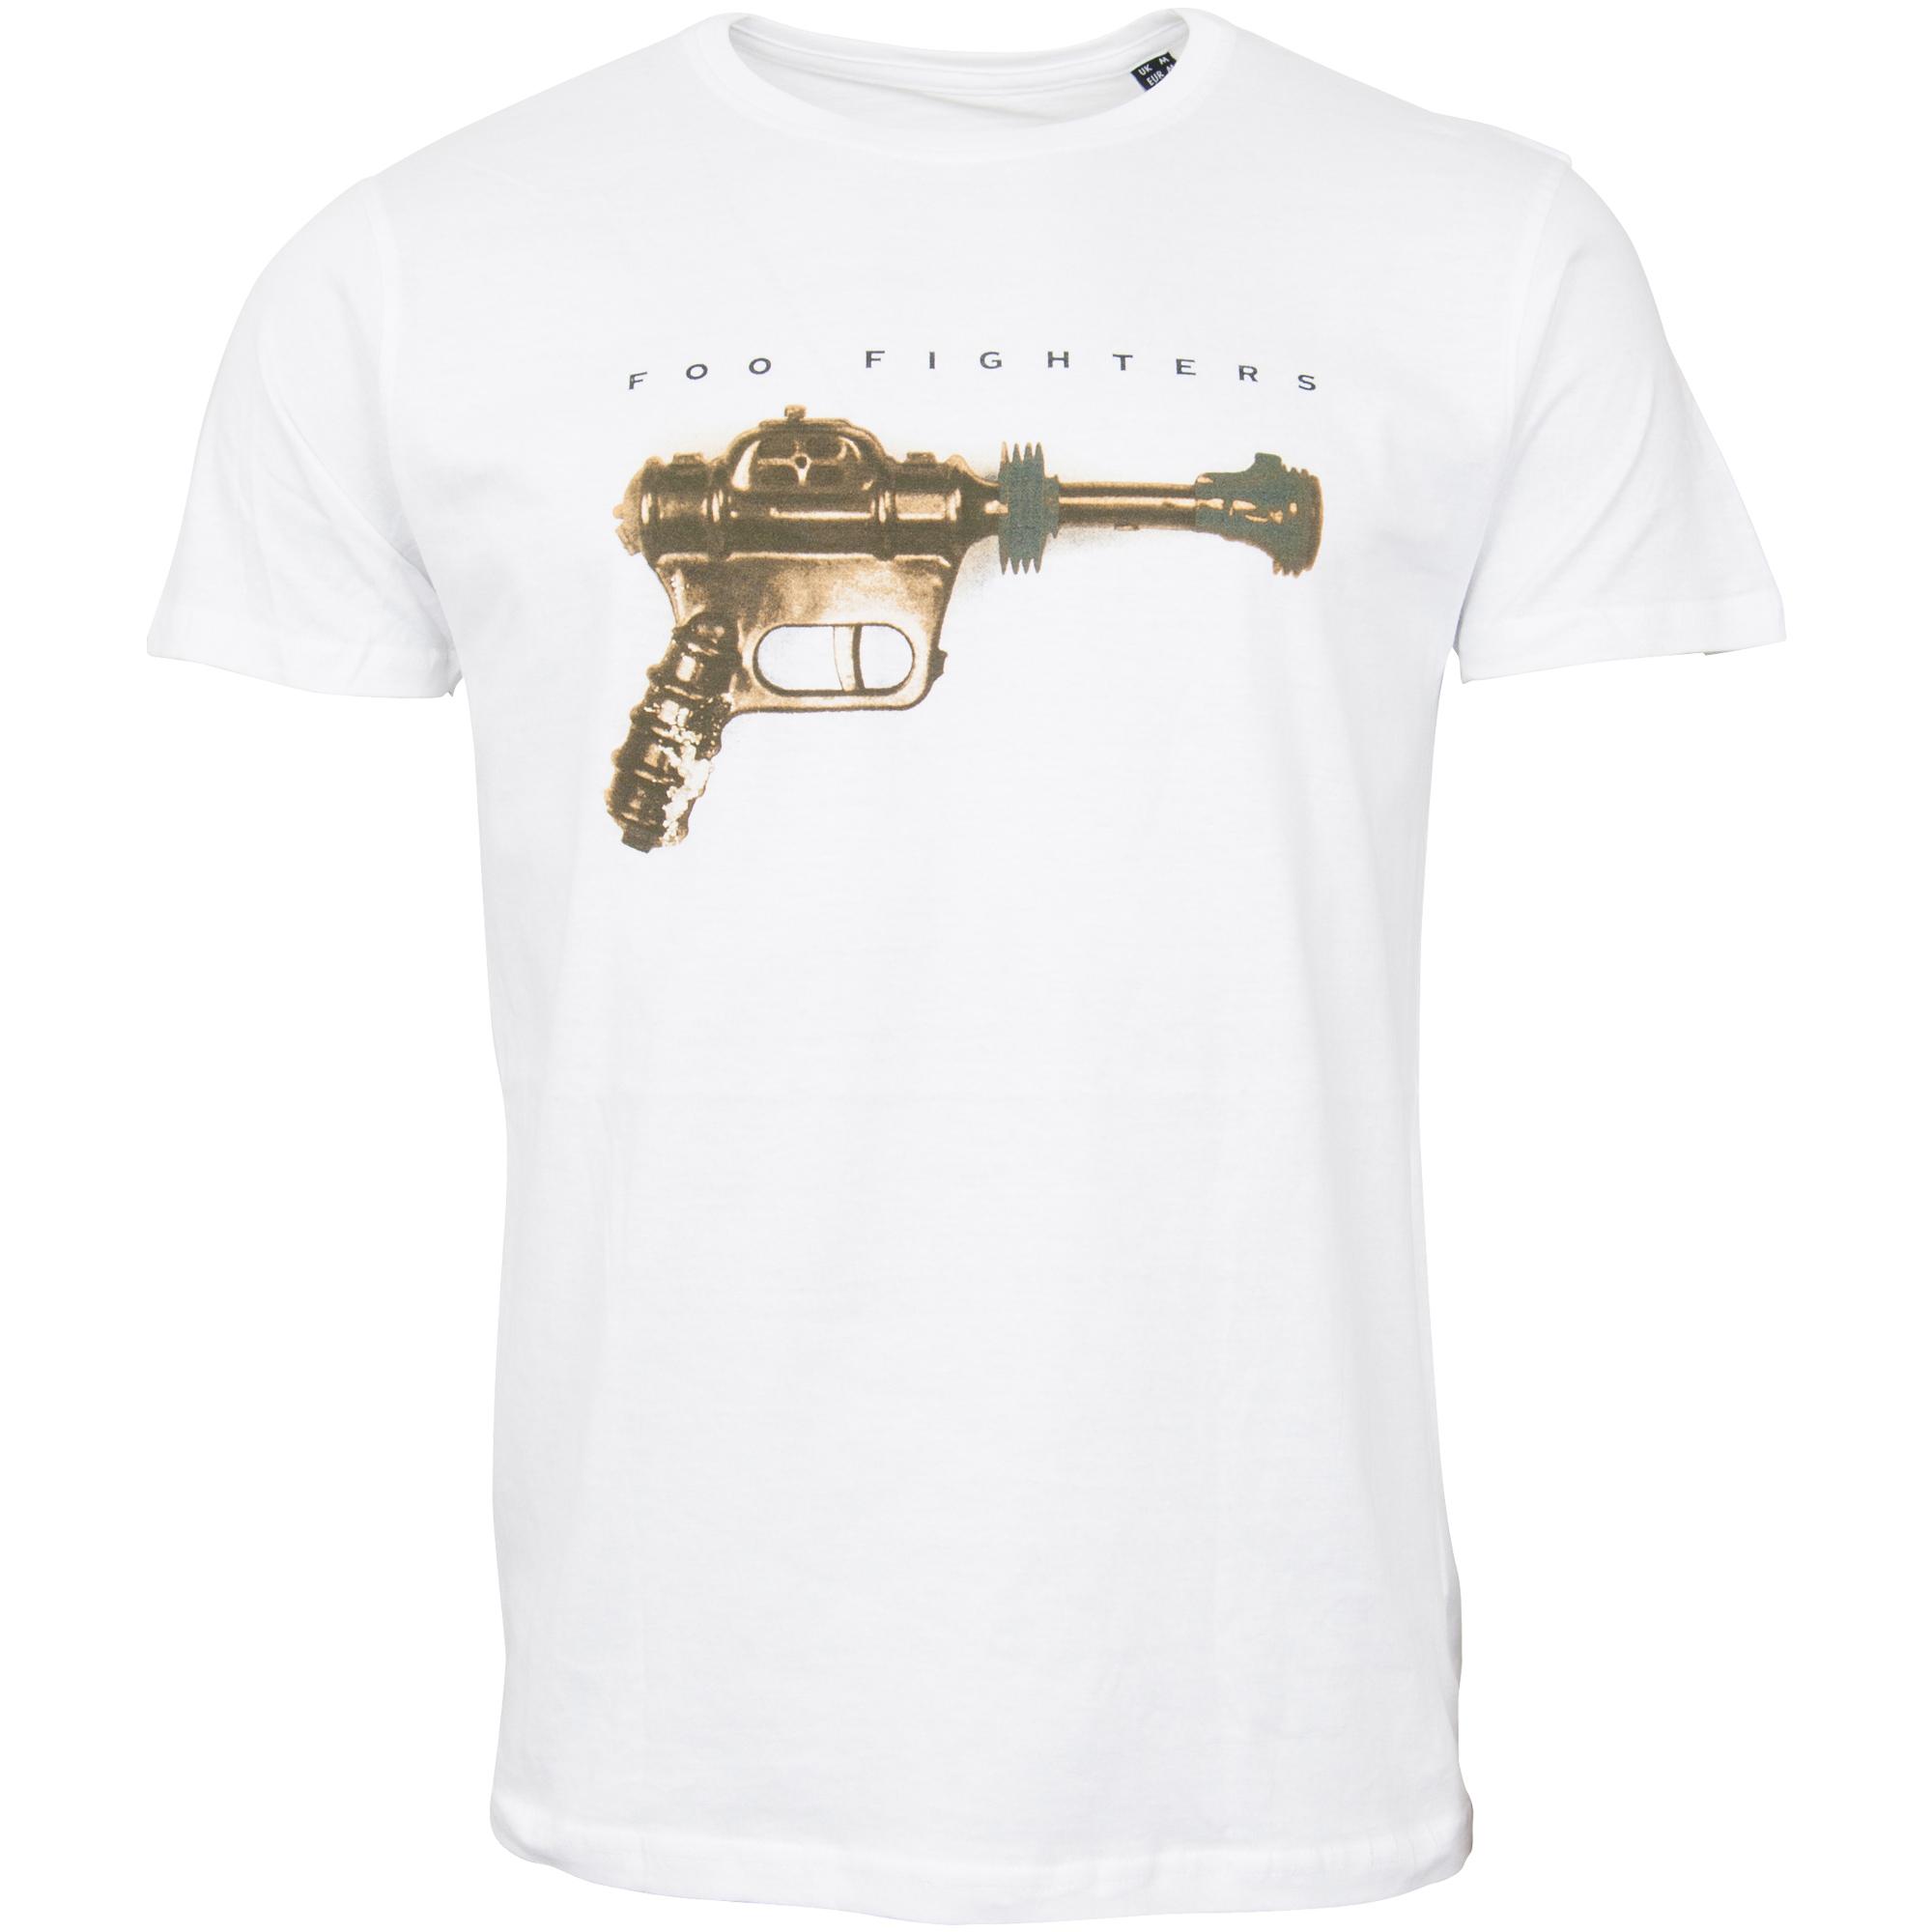 Foo Fighters - T-Shirt Ray Gun - weiß